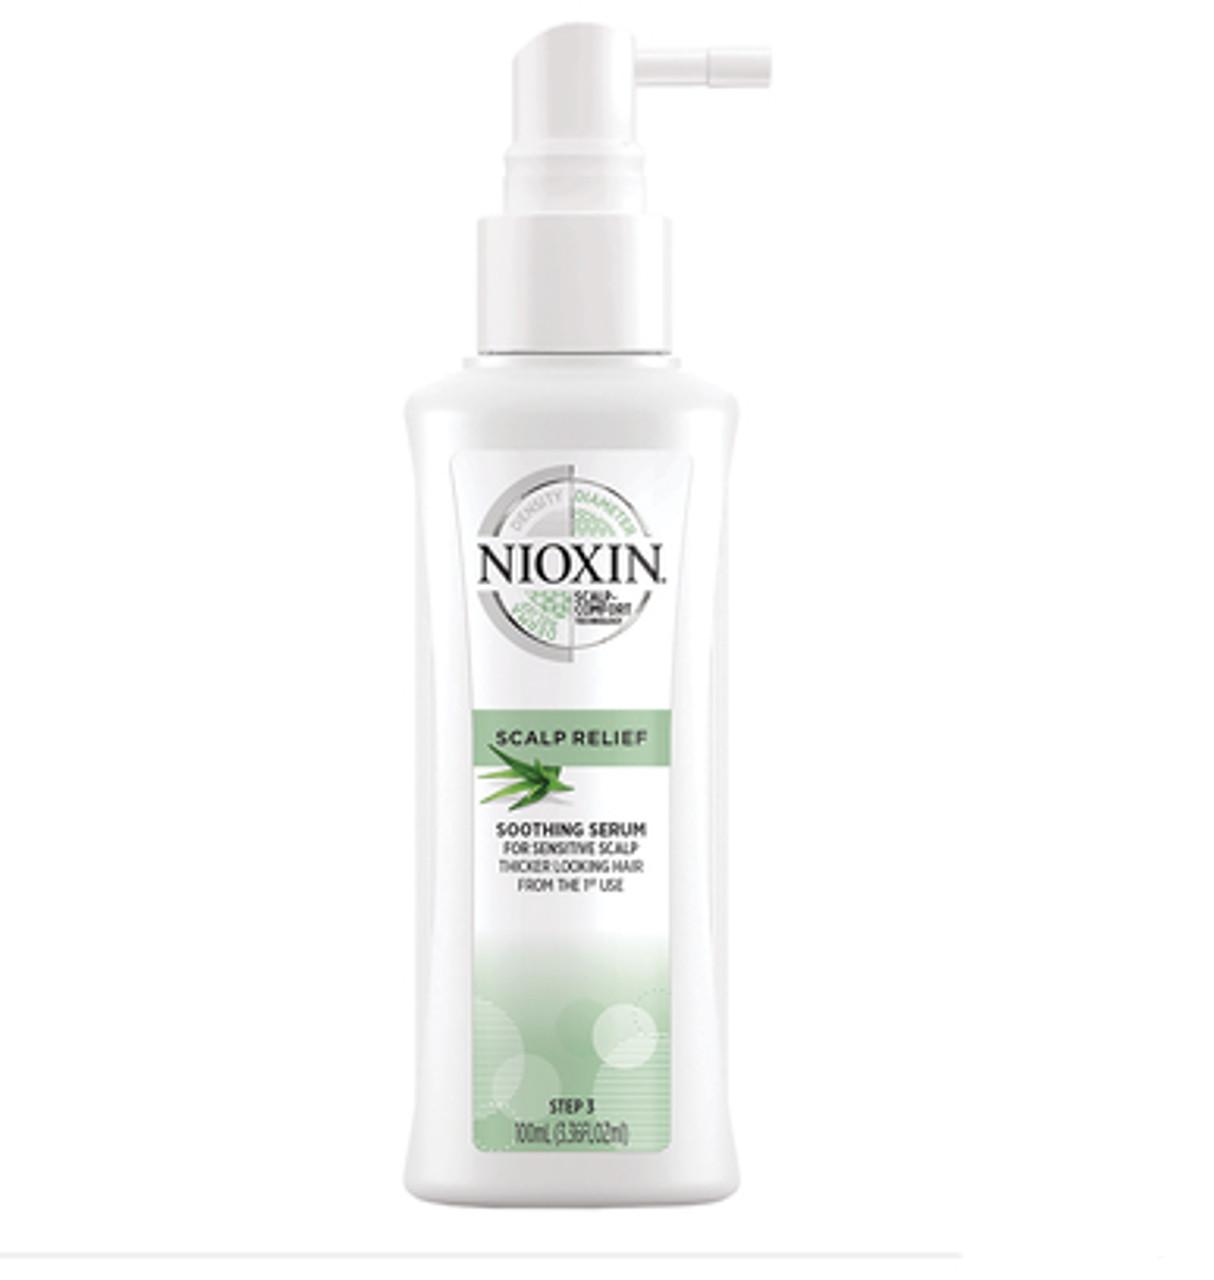 Nioxin Scalp Relief Soothing Serum 3.3 oz